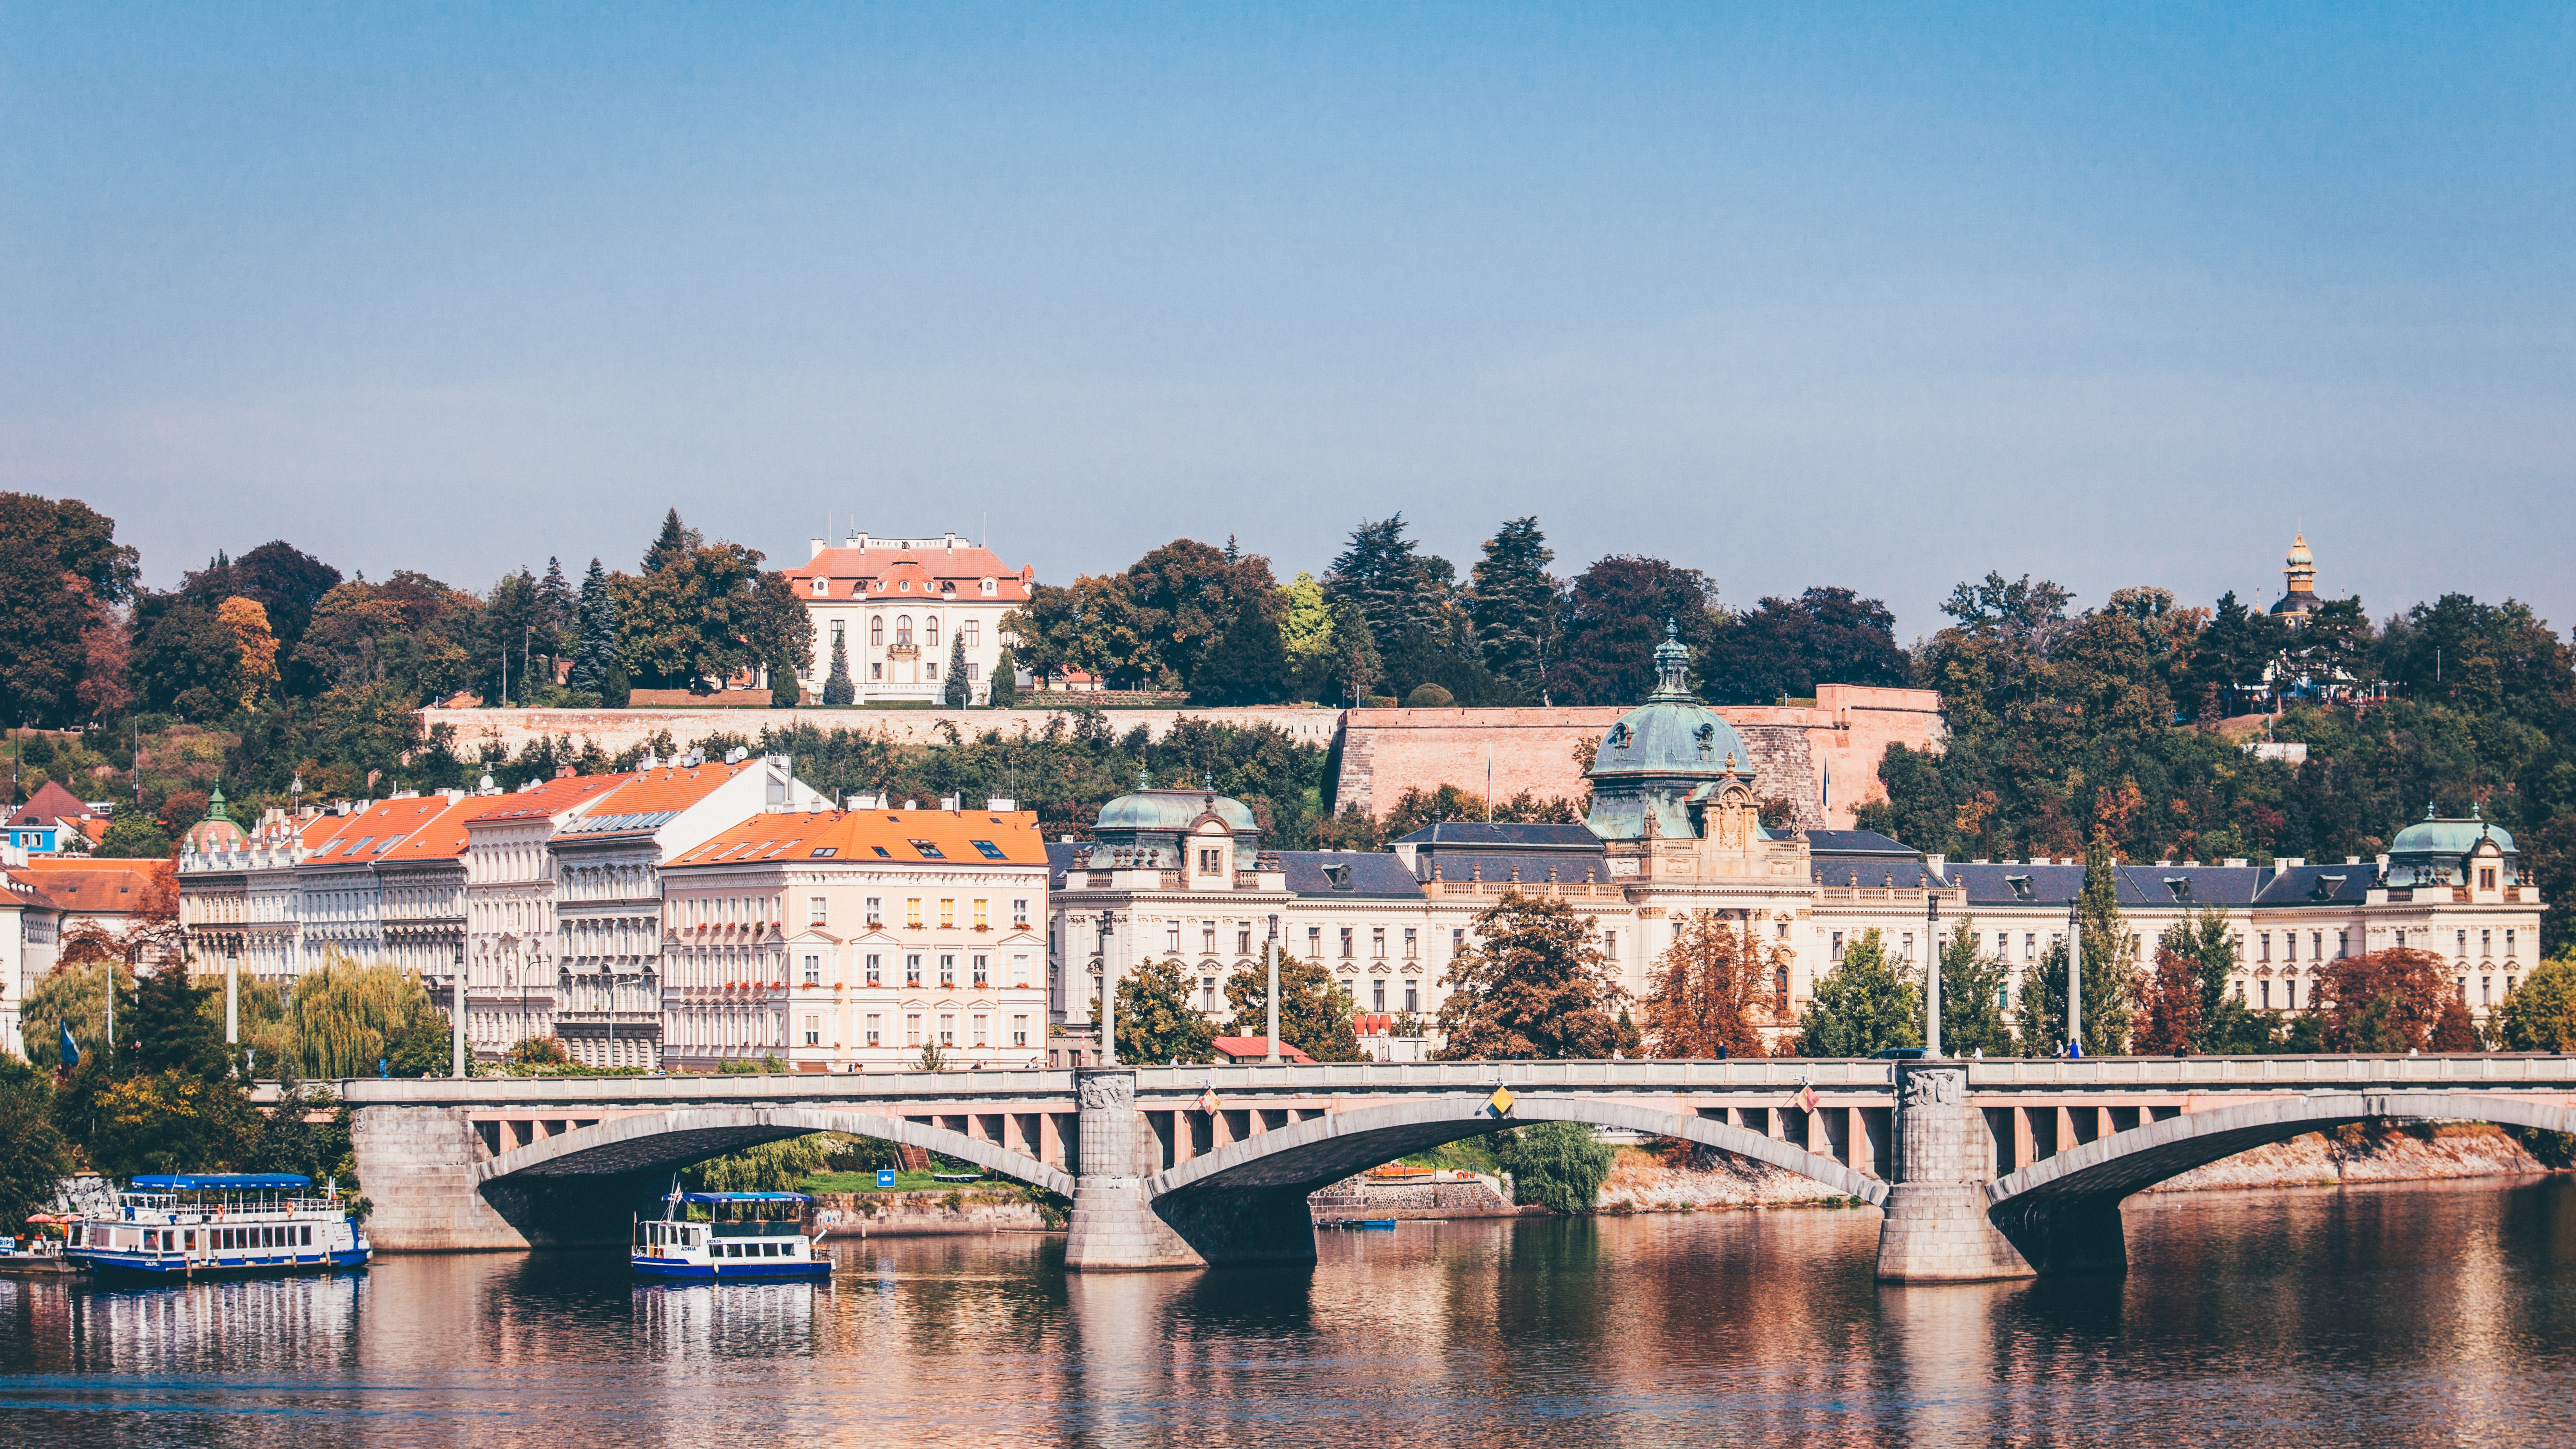 concrete bridge near buildings during daytime